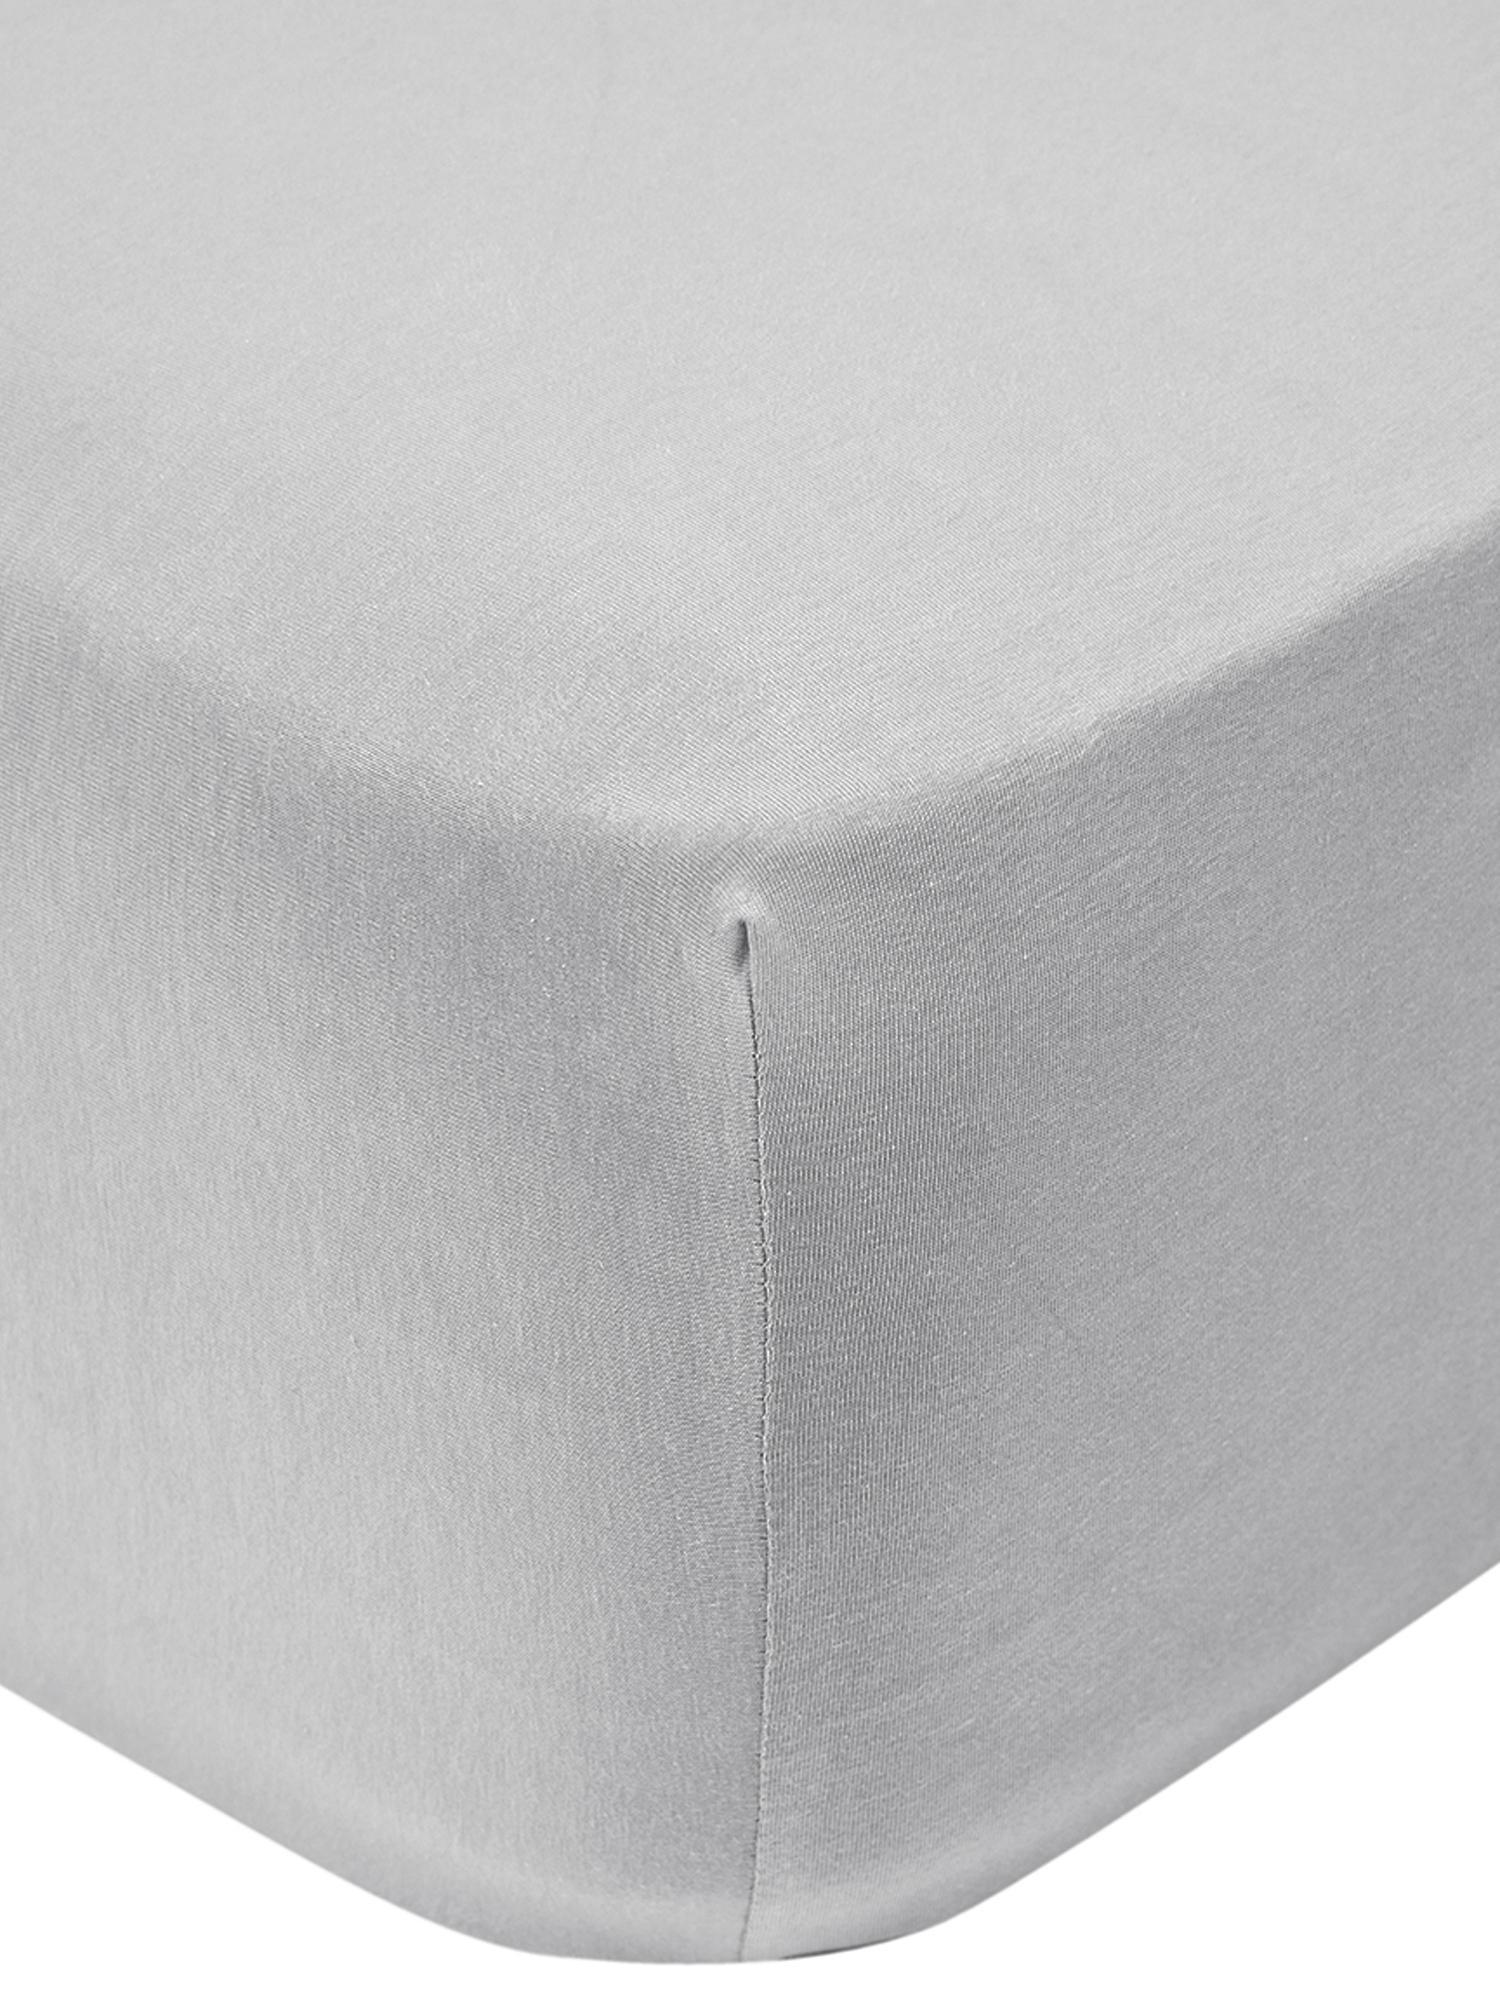 Boxspring-Spannbettlaken Lara, Jersey-Elasthan, 95% Baumwolle, 5% Elasthan, Hellgrau, 200 x 200 cm